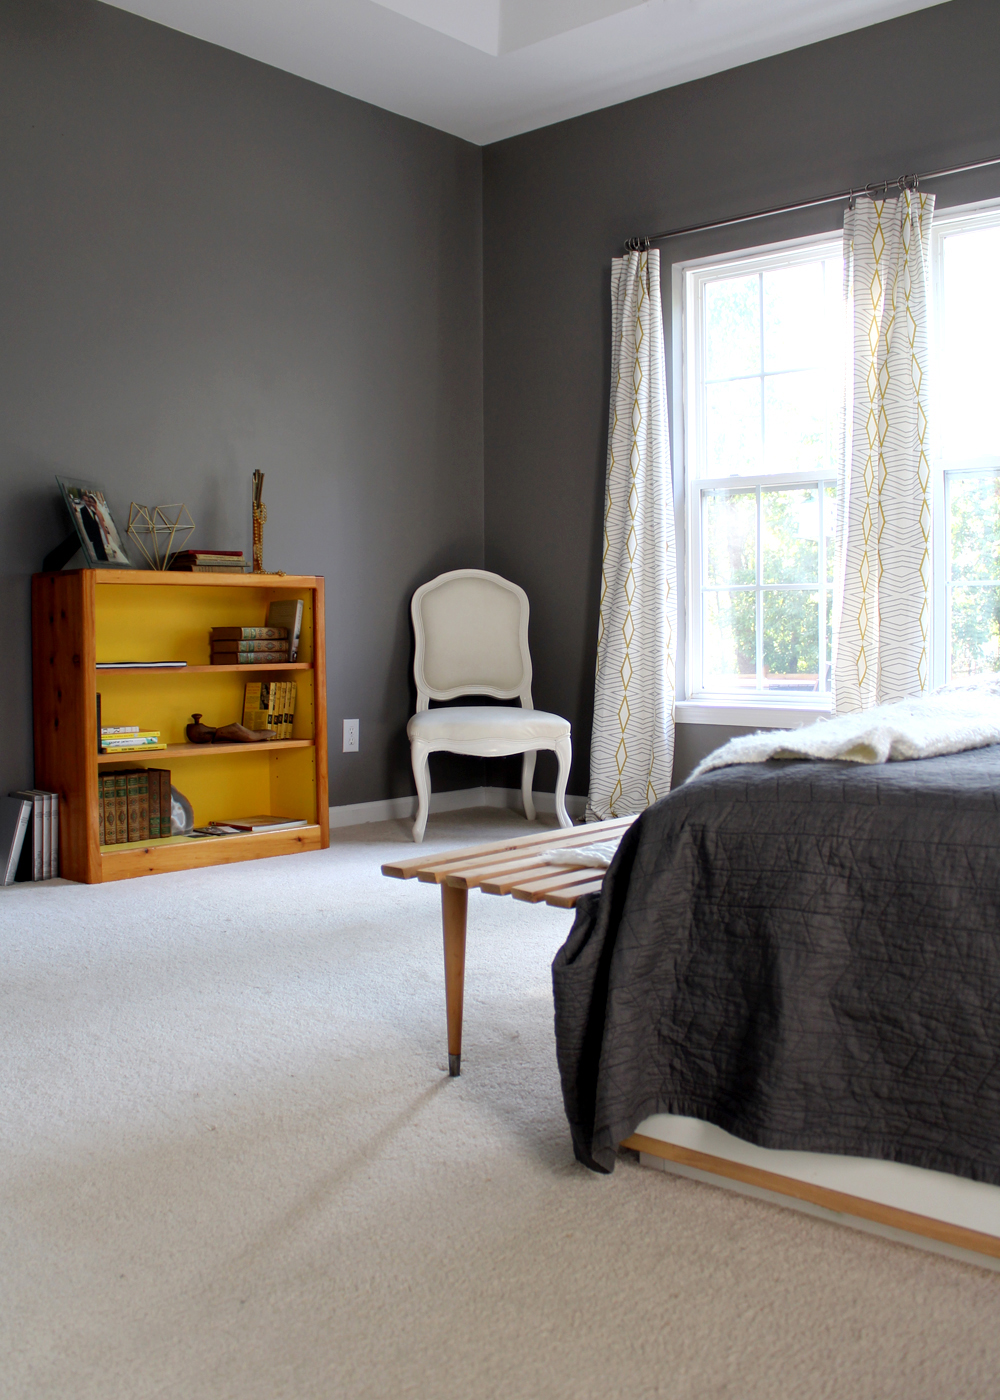 budget-friendly master bedroom makeover